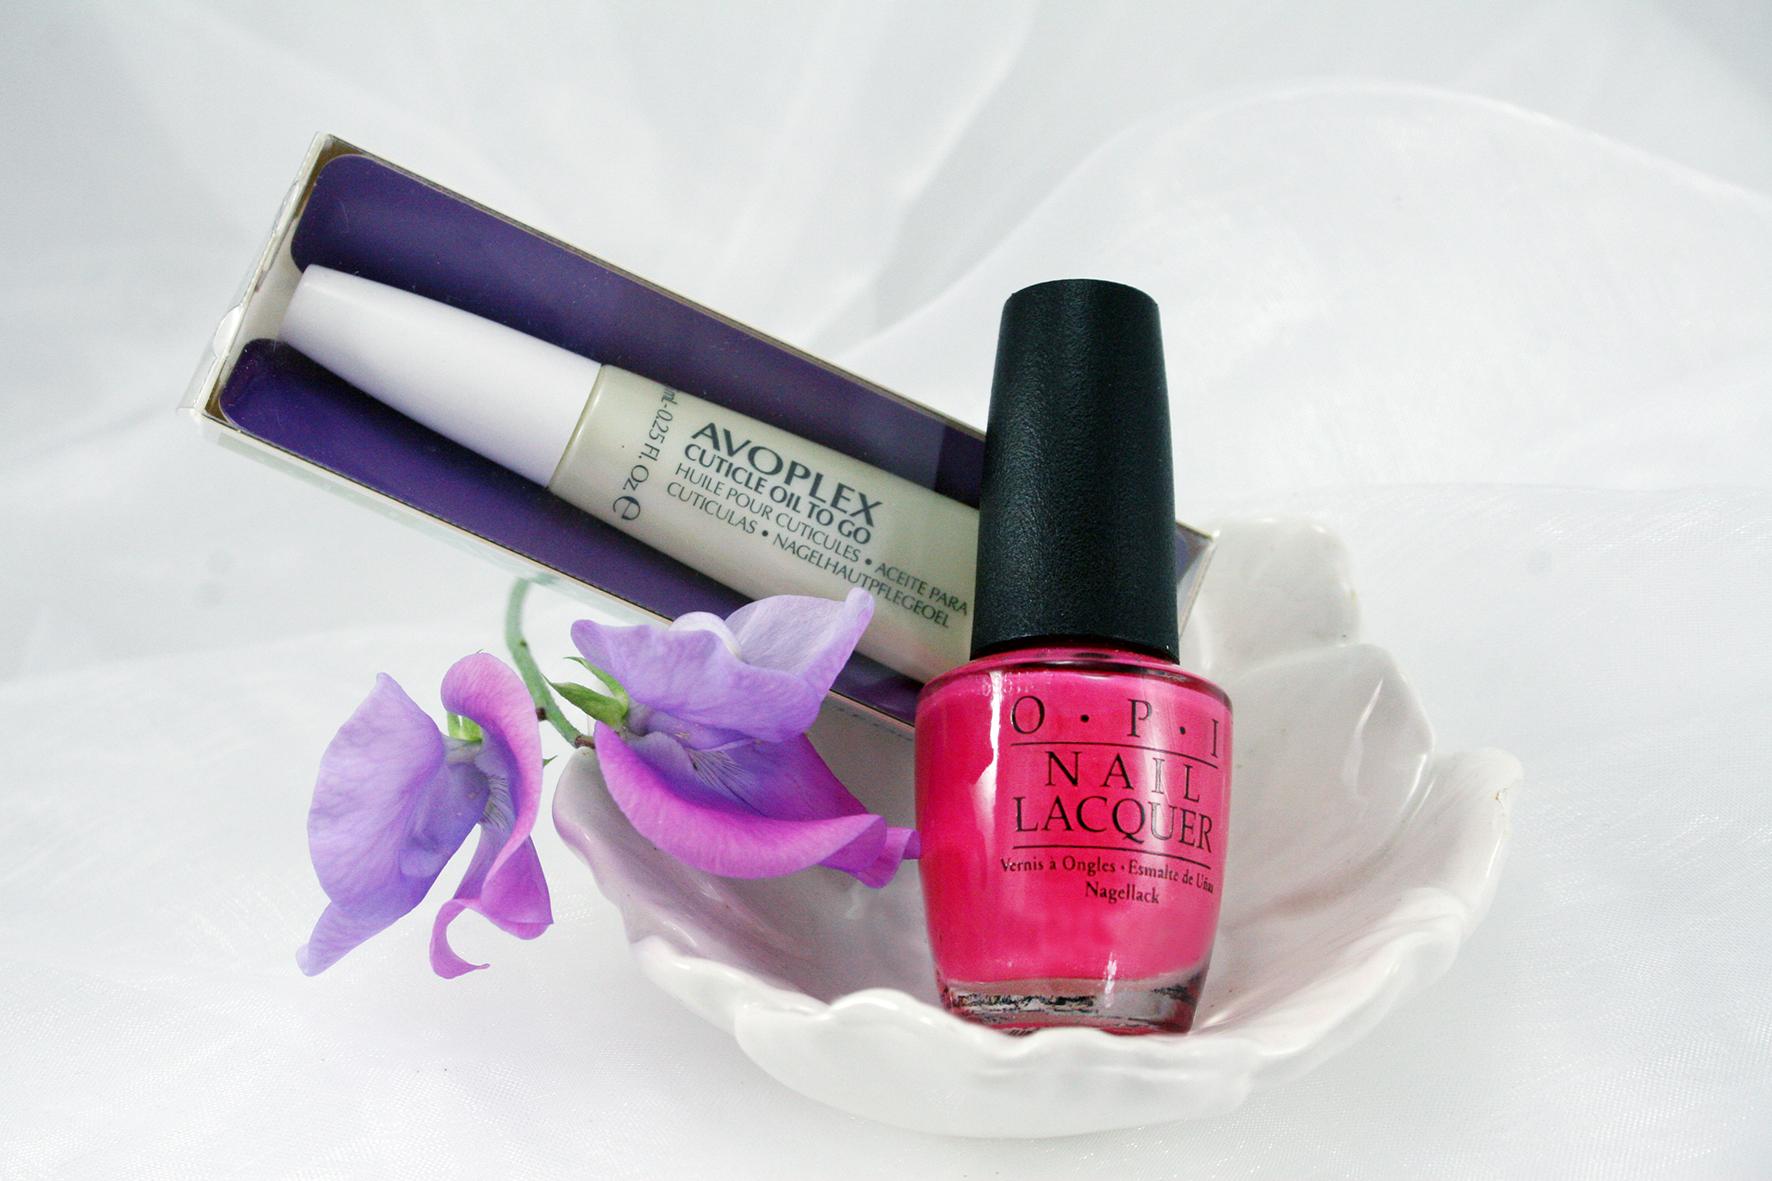 OPI pink Avoplex.jpg